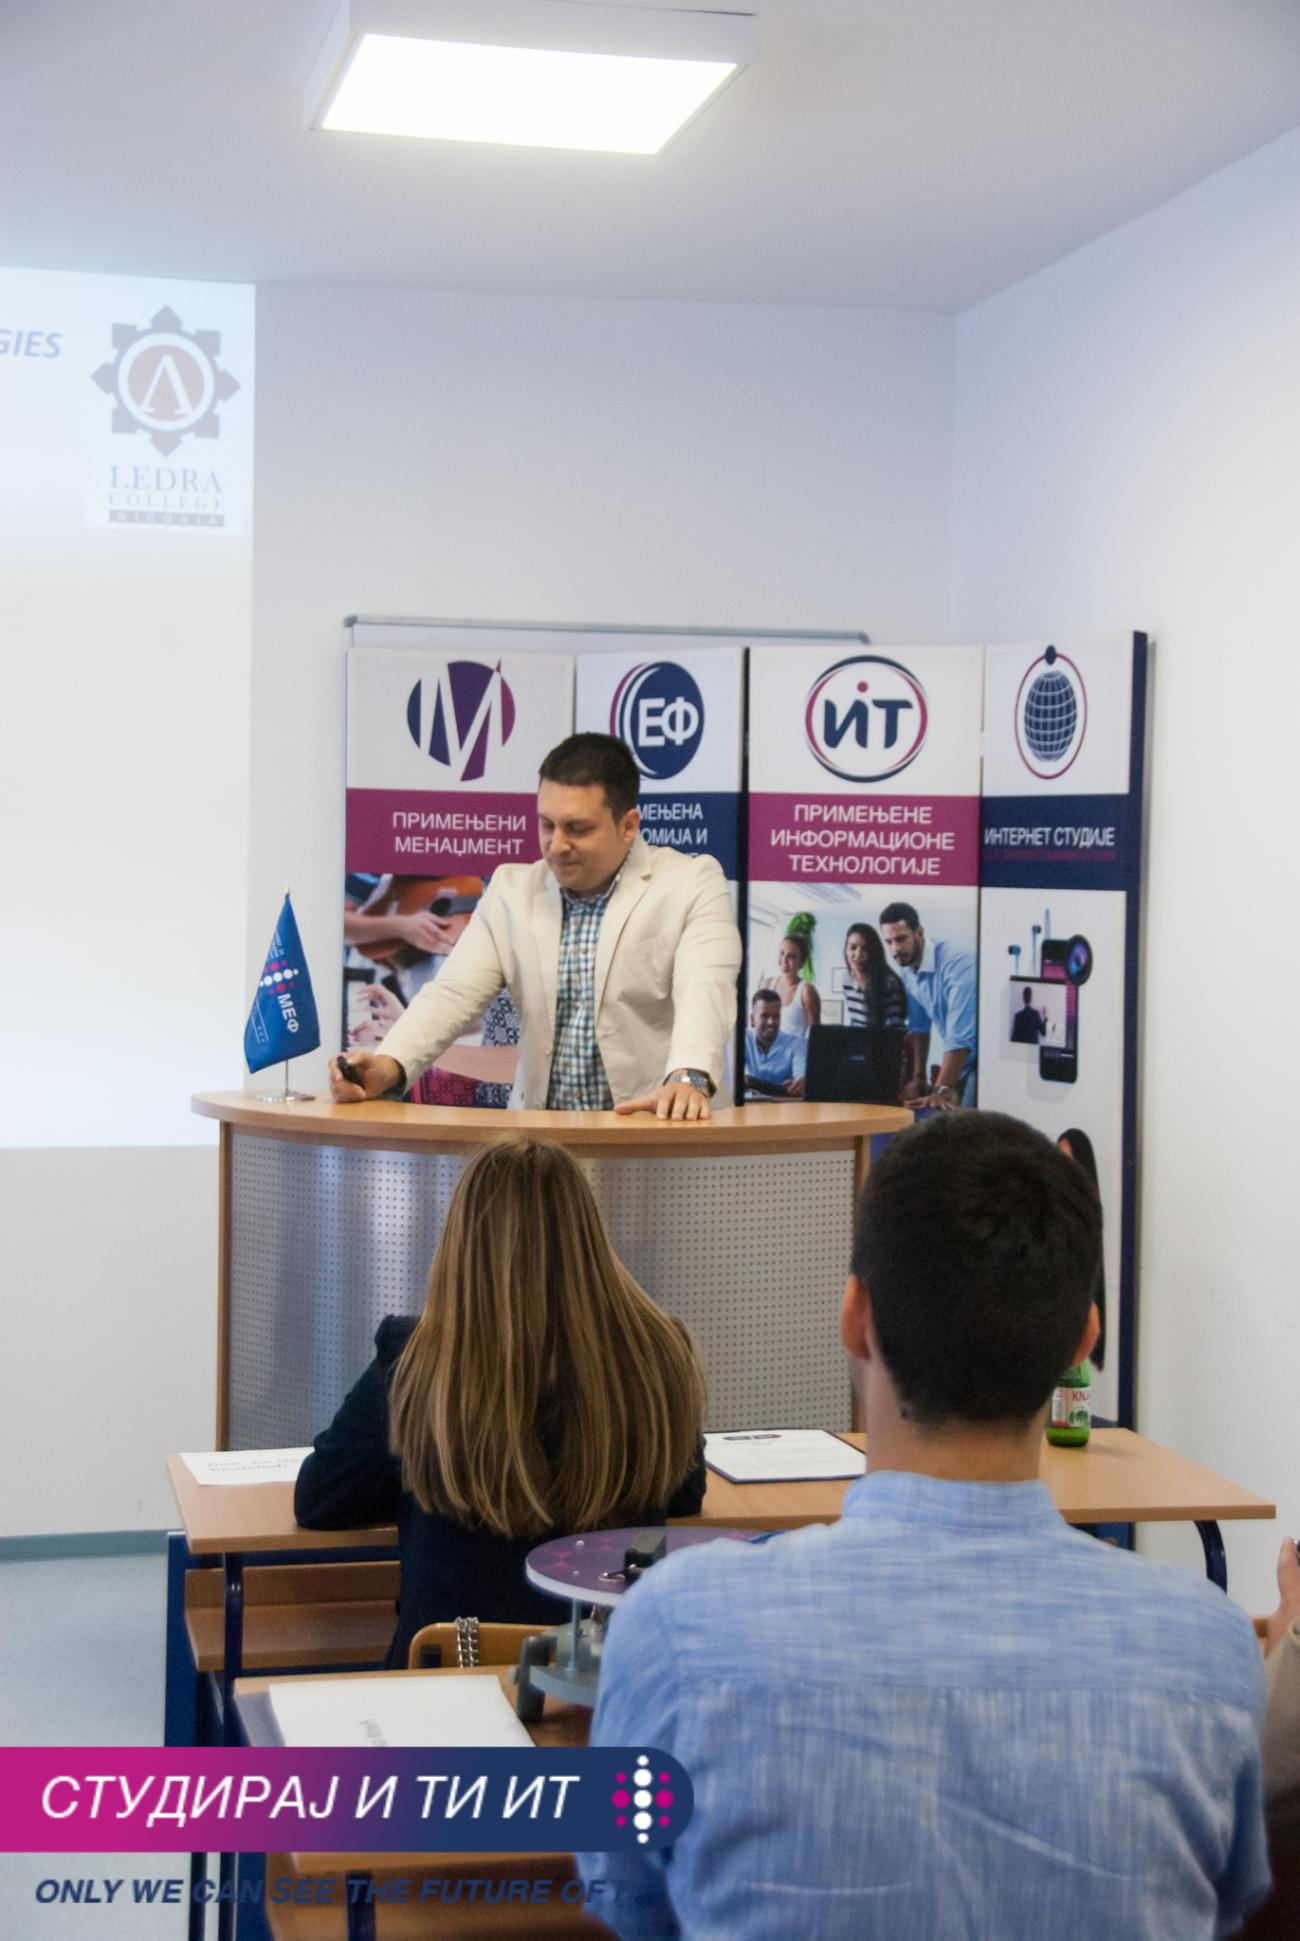 МЕФ Факултет